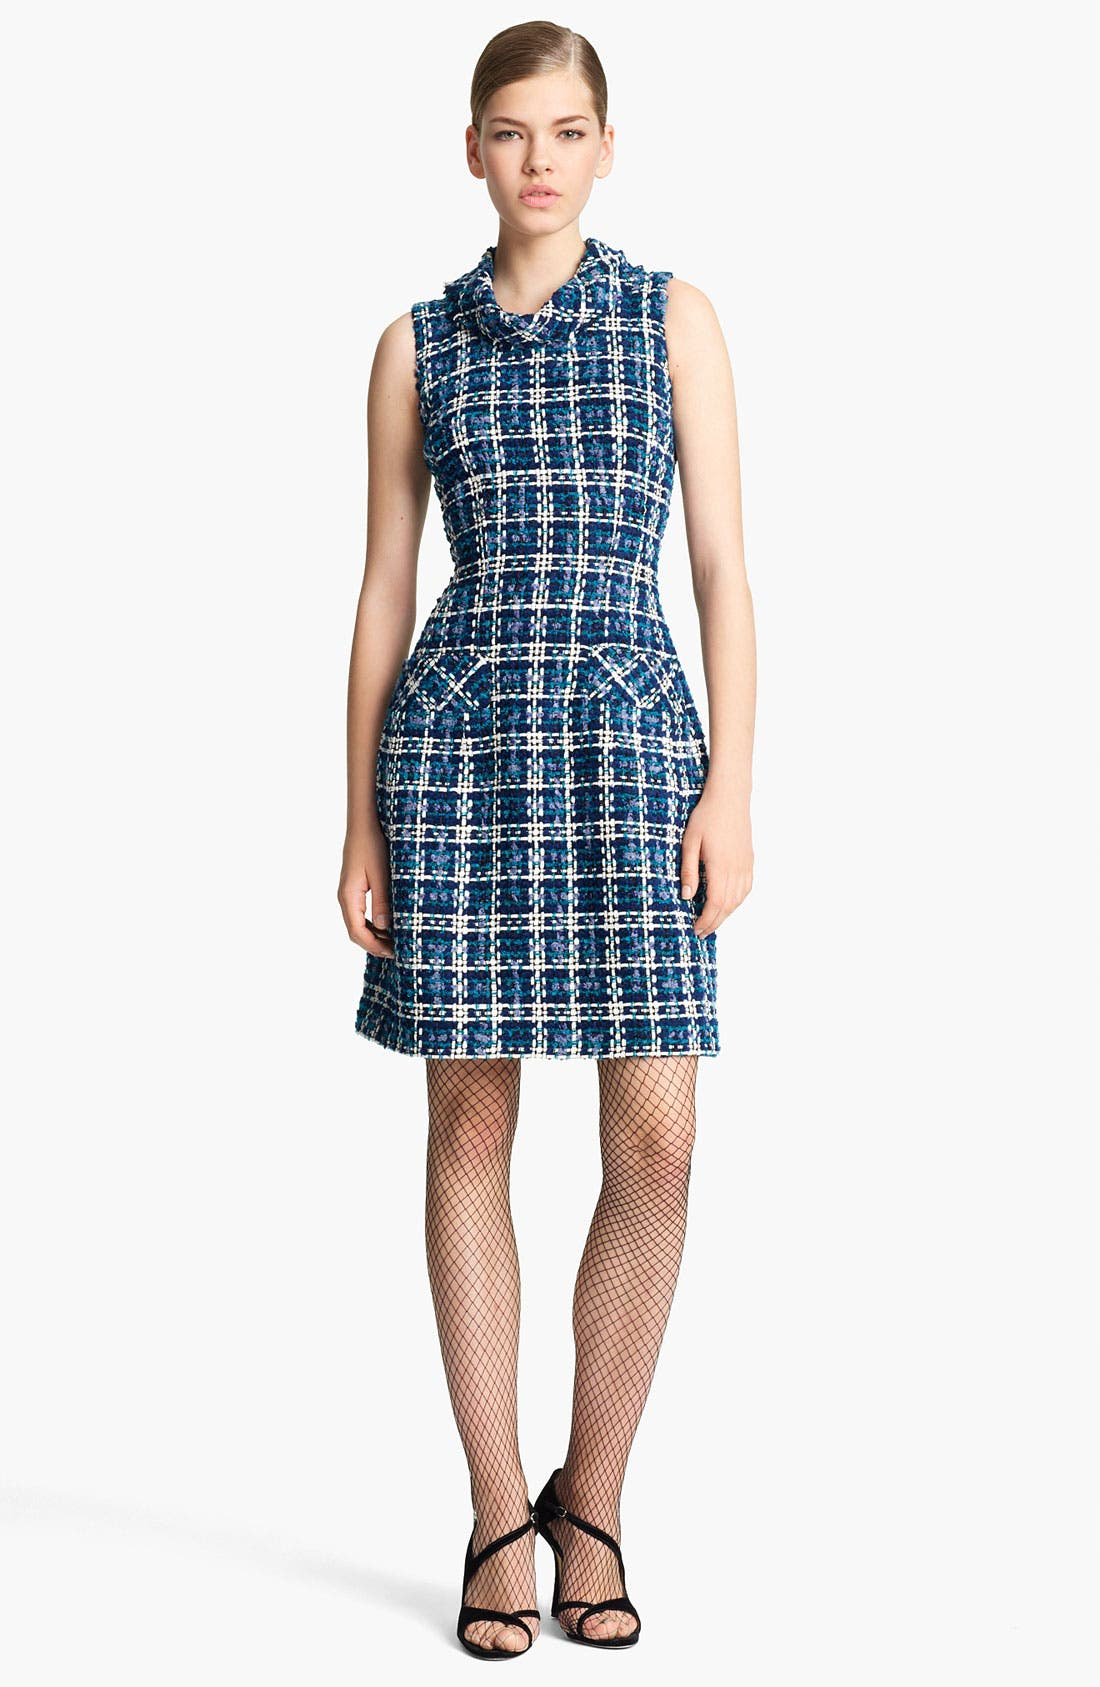 Alternate Image 1 Selected - Oscar de la Renta Tweed Sheath Dress